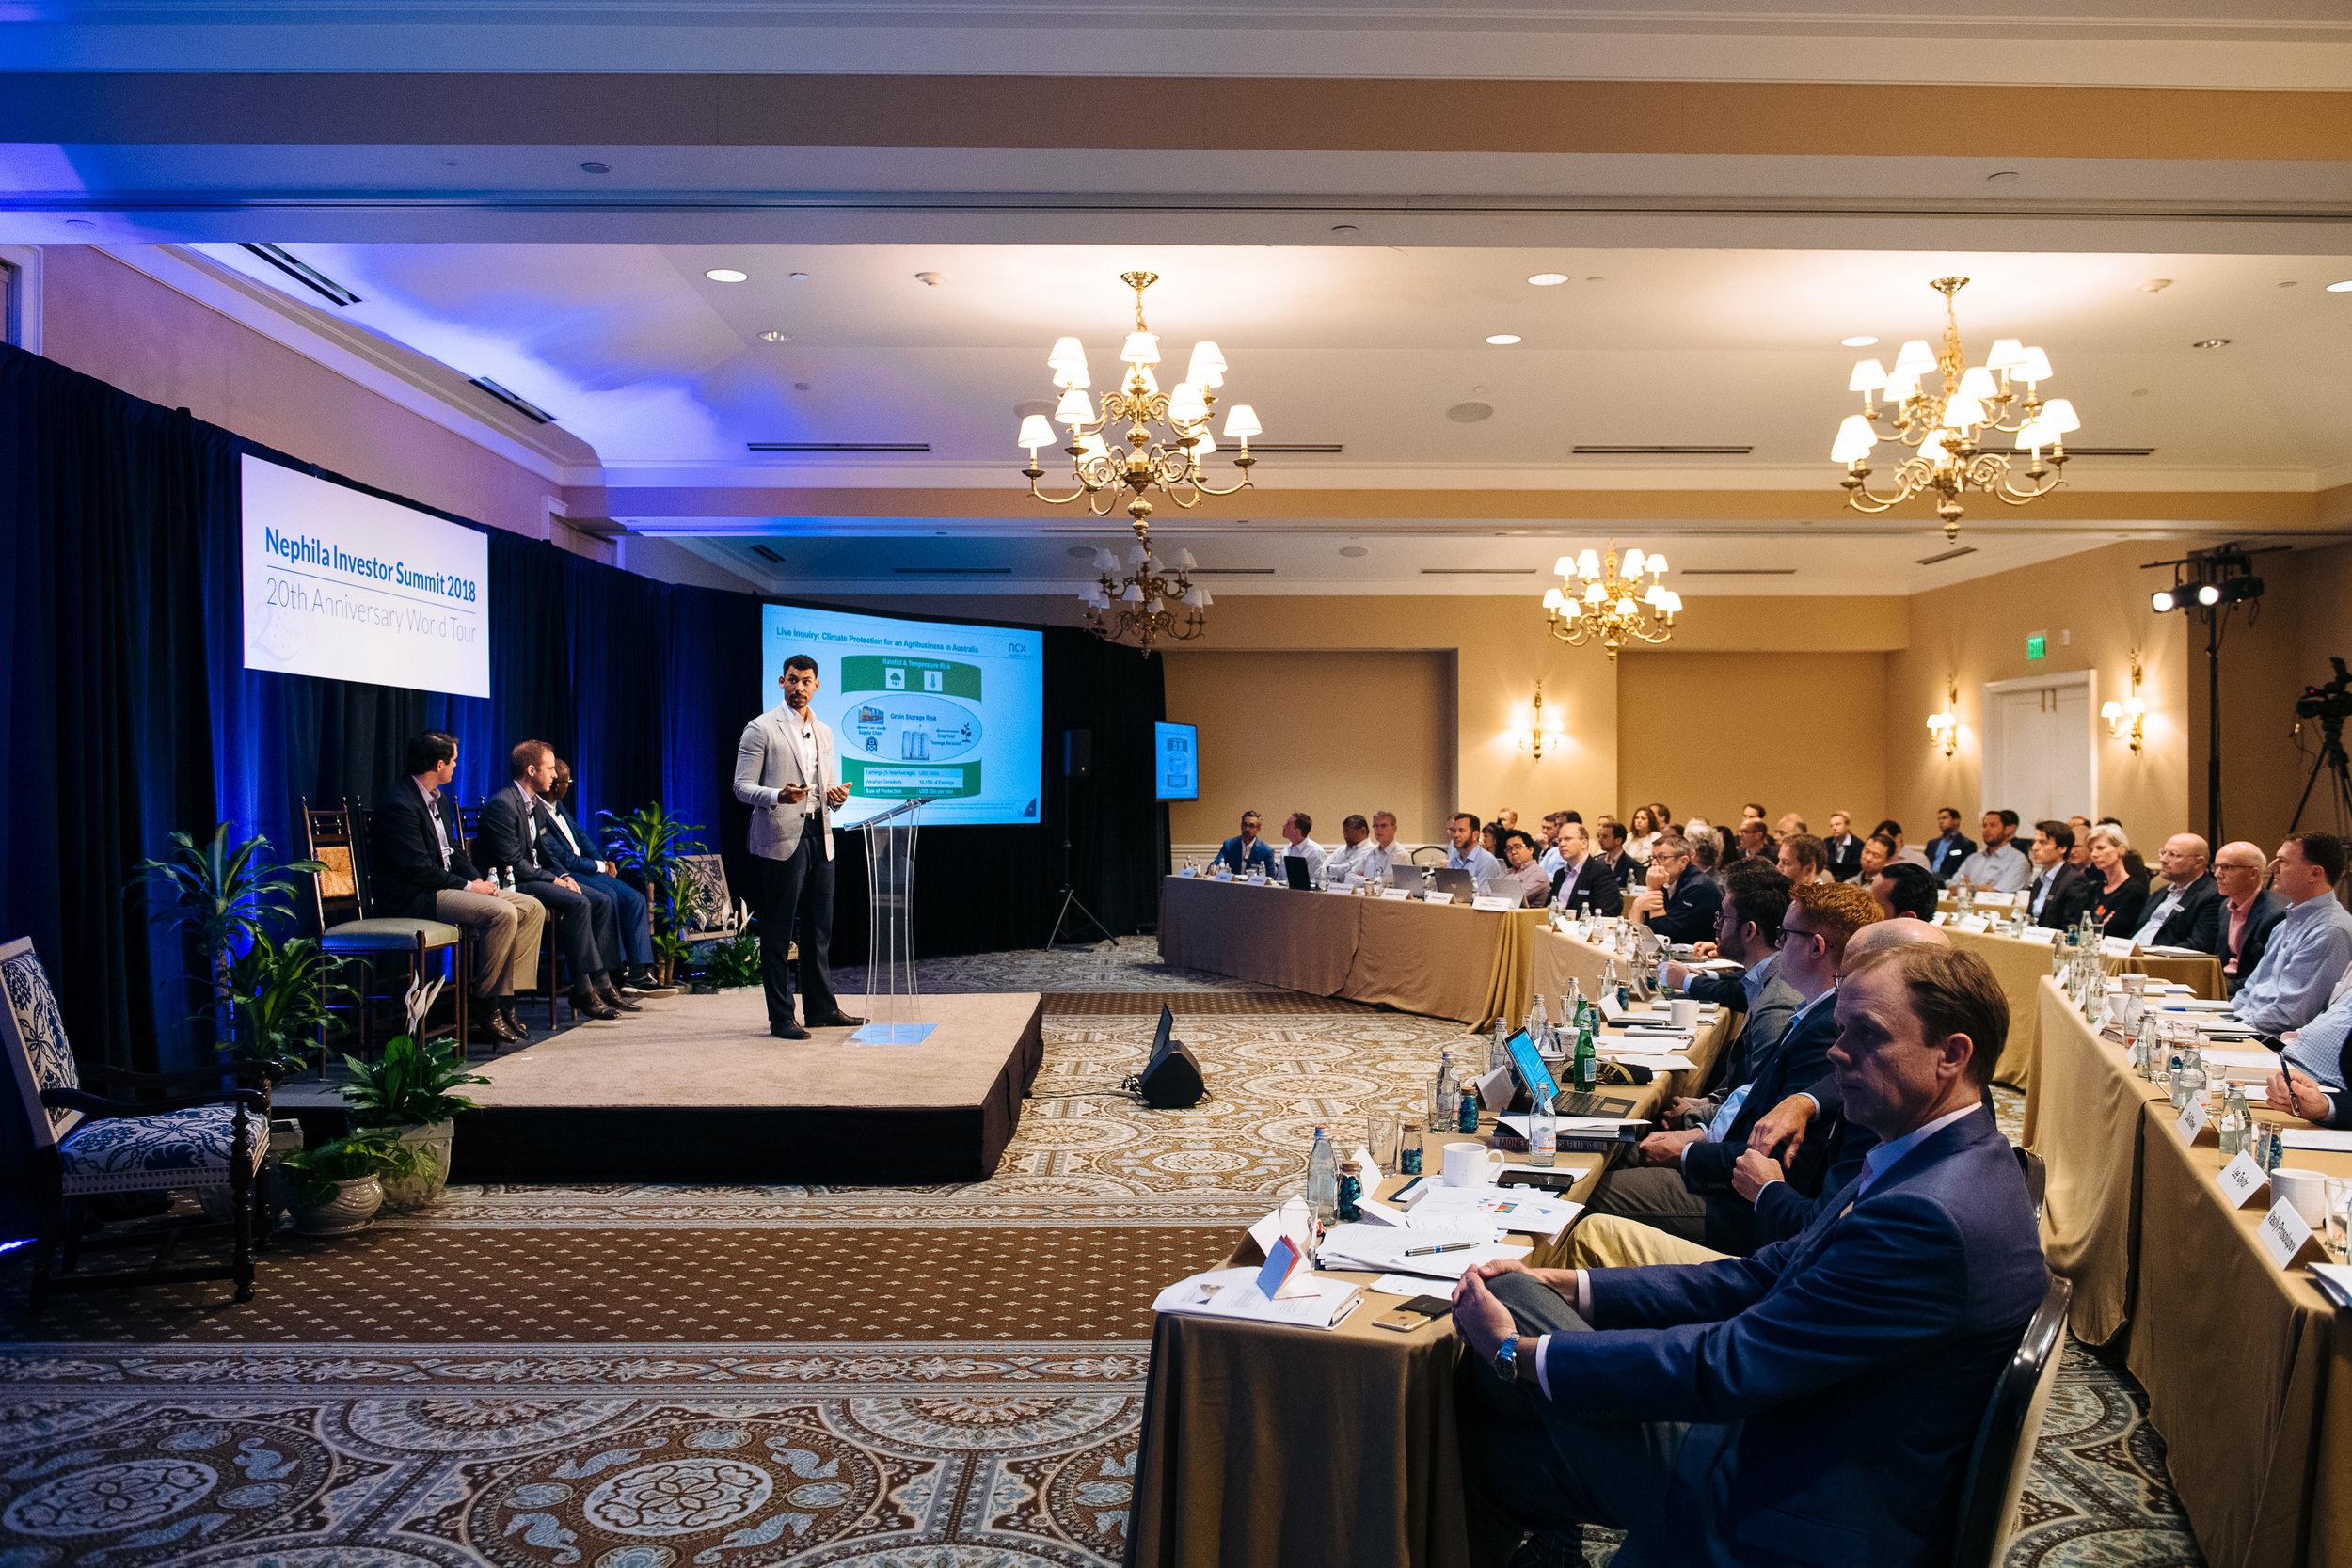 Nephila — Investor Summit 2018